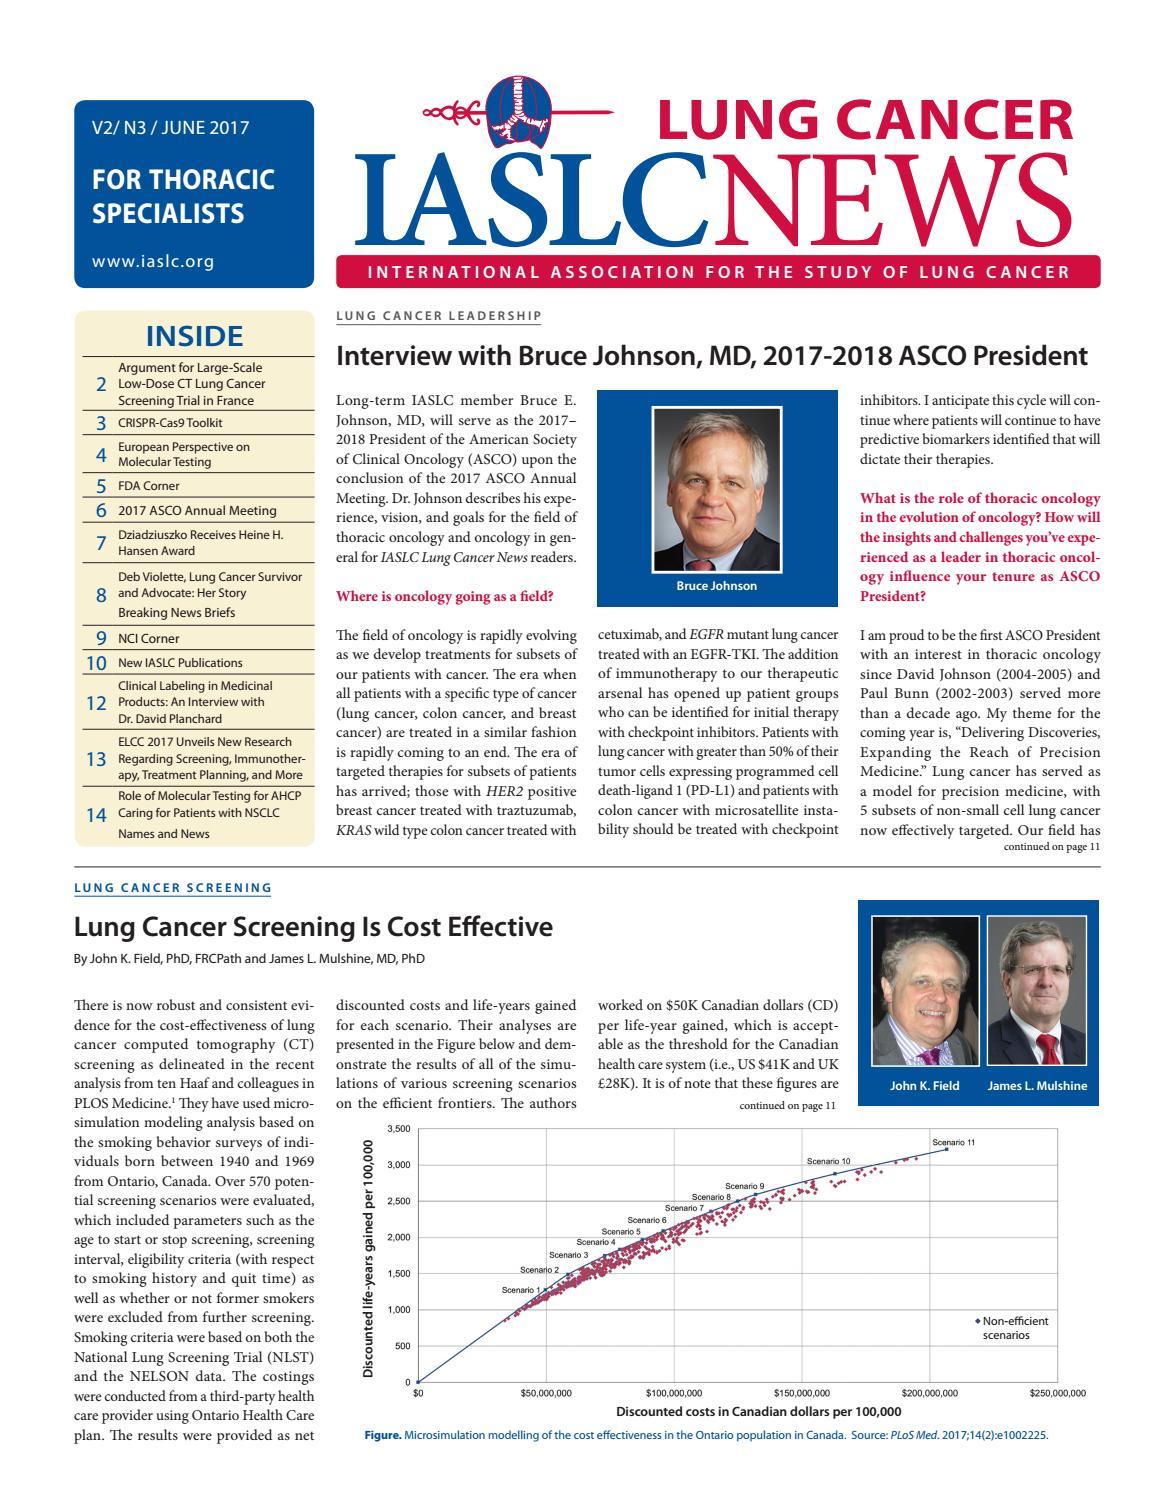 IASLC Lung Cancer News - V2, N3